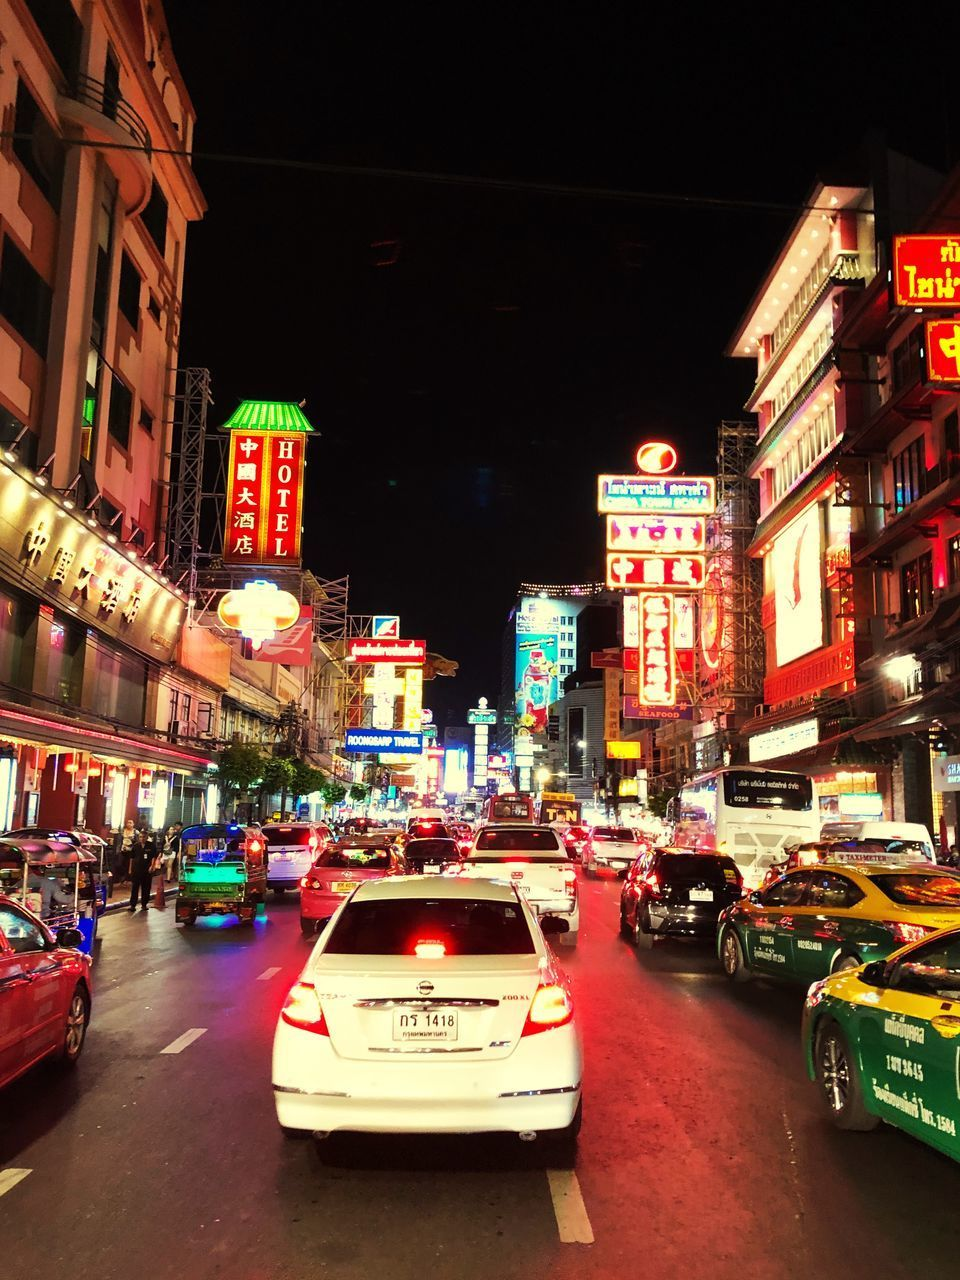 CARS ON CITY STREET AT NIGHT